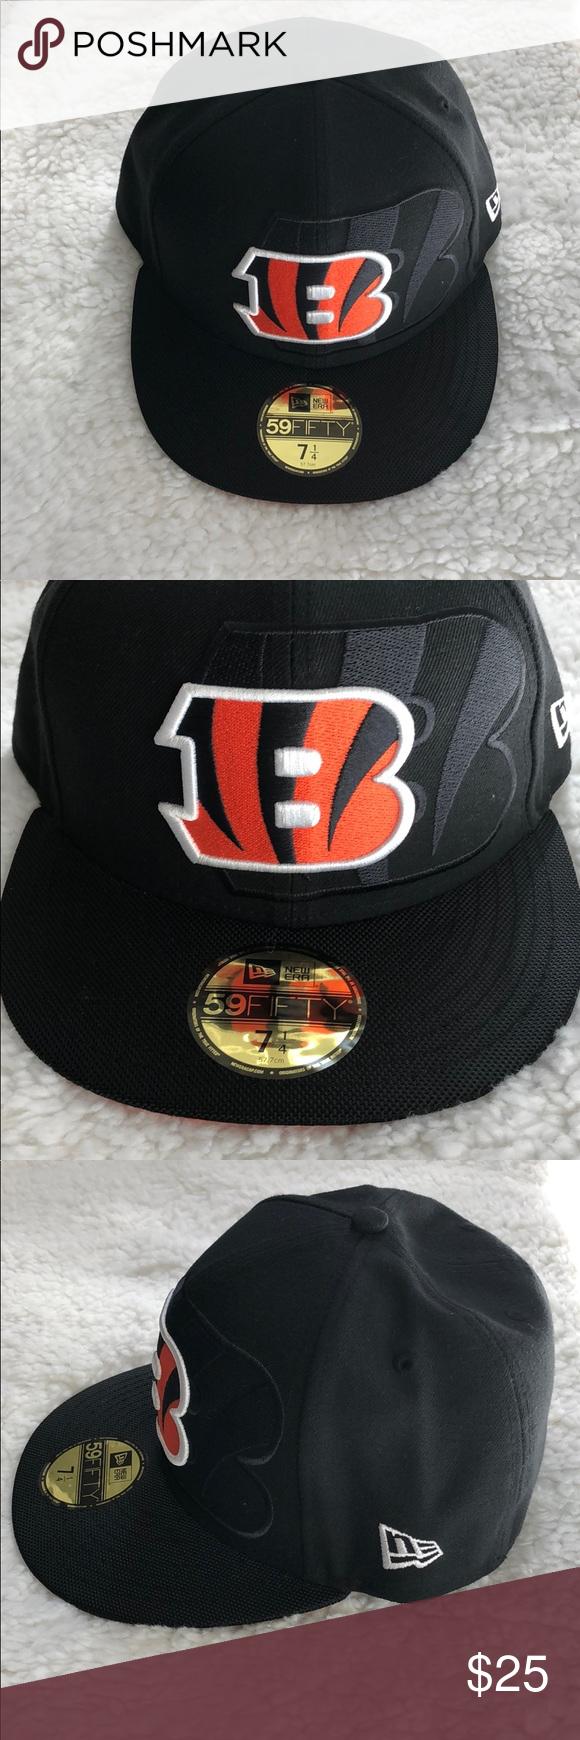 "huge discount 9ced6 8678a New Era Cincinnati Bengals 59fFIFTY Cap Black and orange cincinnati Bengals  new era ""NFL"" fitted cap featuring embroidered Cincinnati Bengals team logo  on ..."